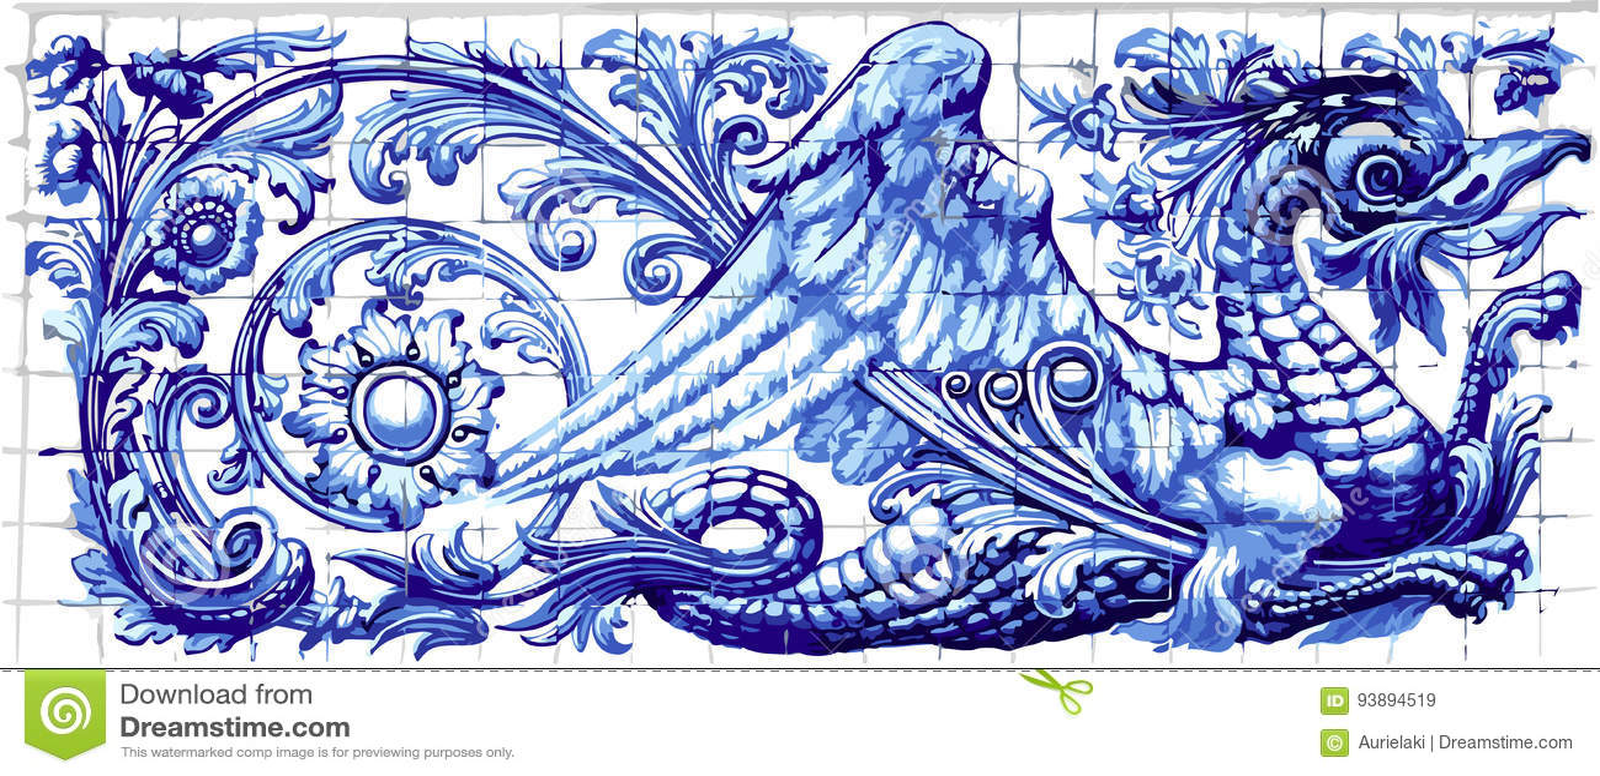 Blue Dragon Azulejo Ceramic Tile Magnet Souvenir Realistic Vector